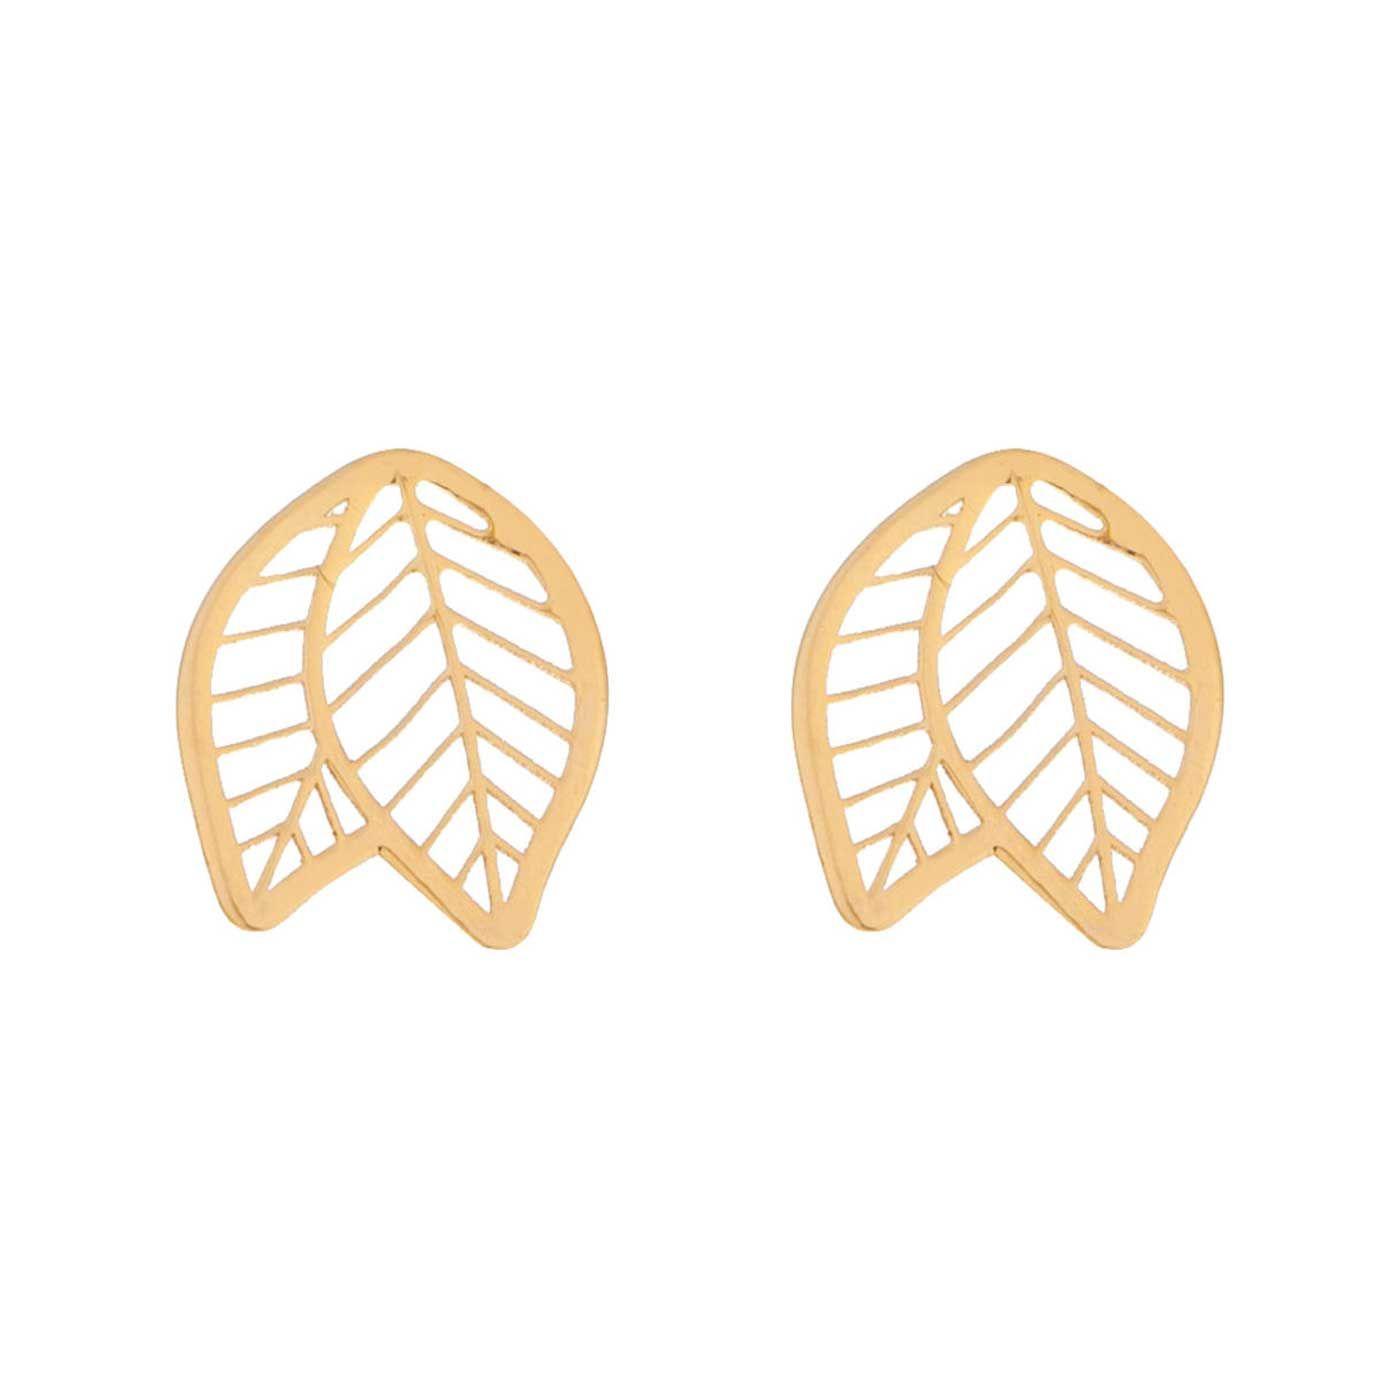 گوشواره طلا 18 عیار زنانه کانیار گالری کد GOA106 -  - 3